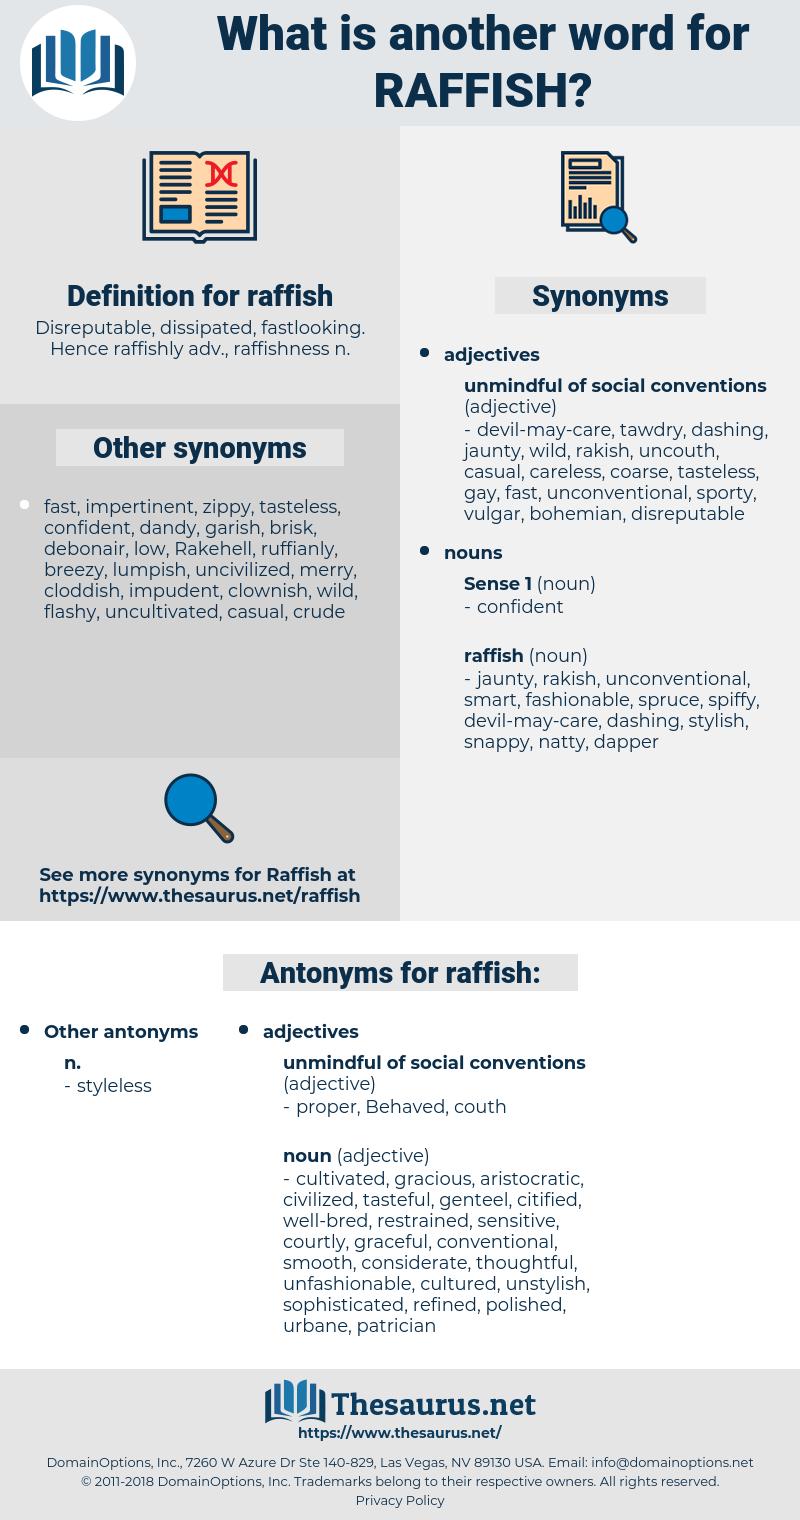 raffish, synonym raffish, another word for raffish, words like raffish, thesaurus raffish